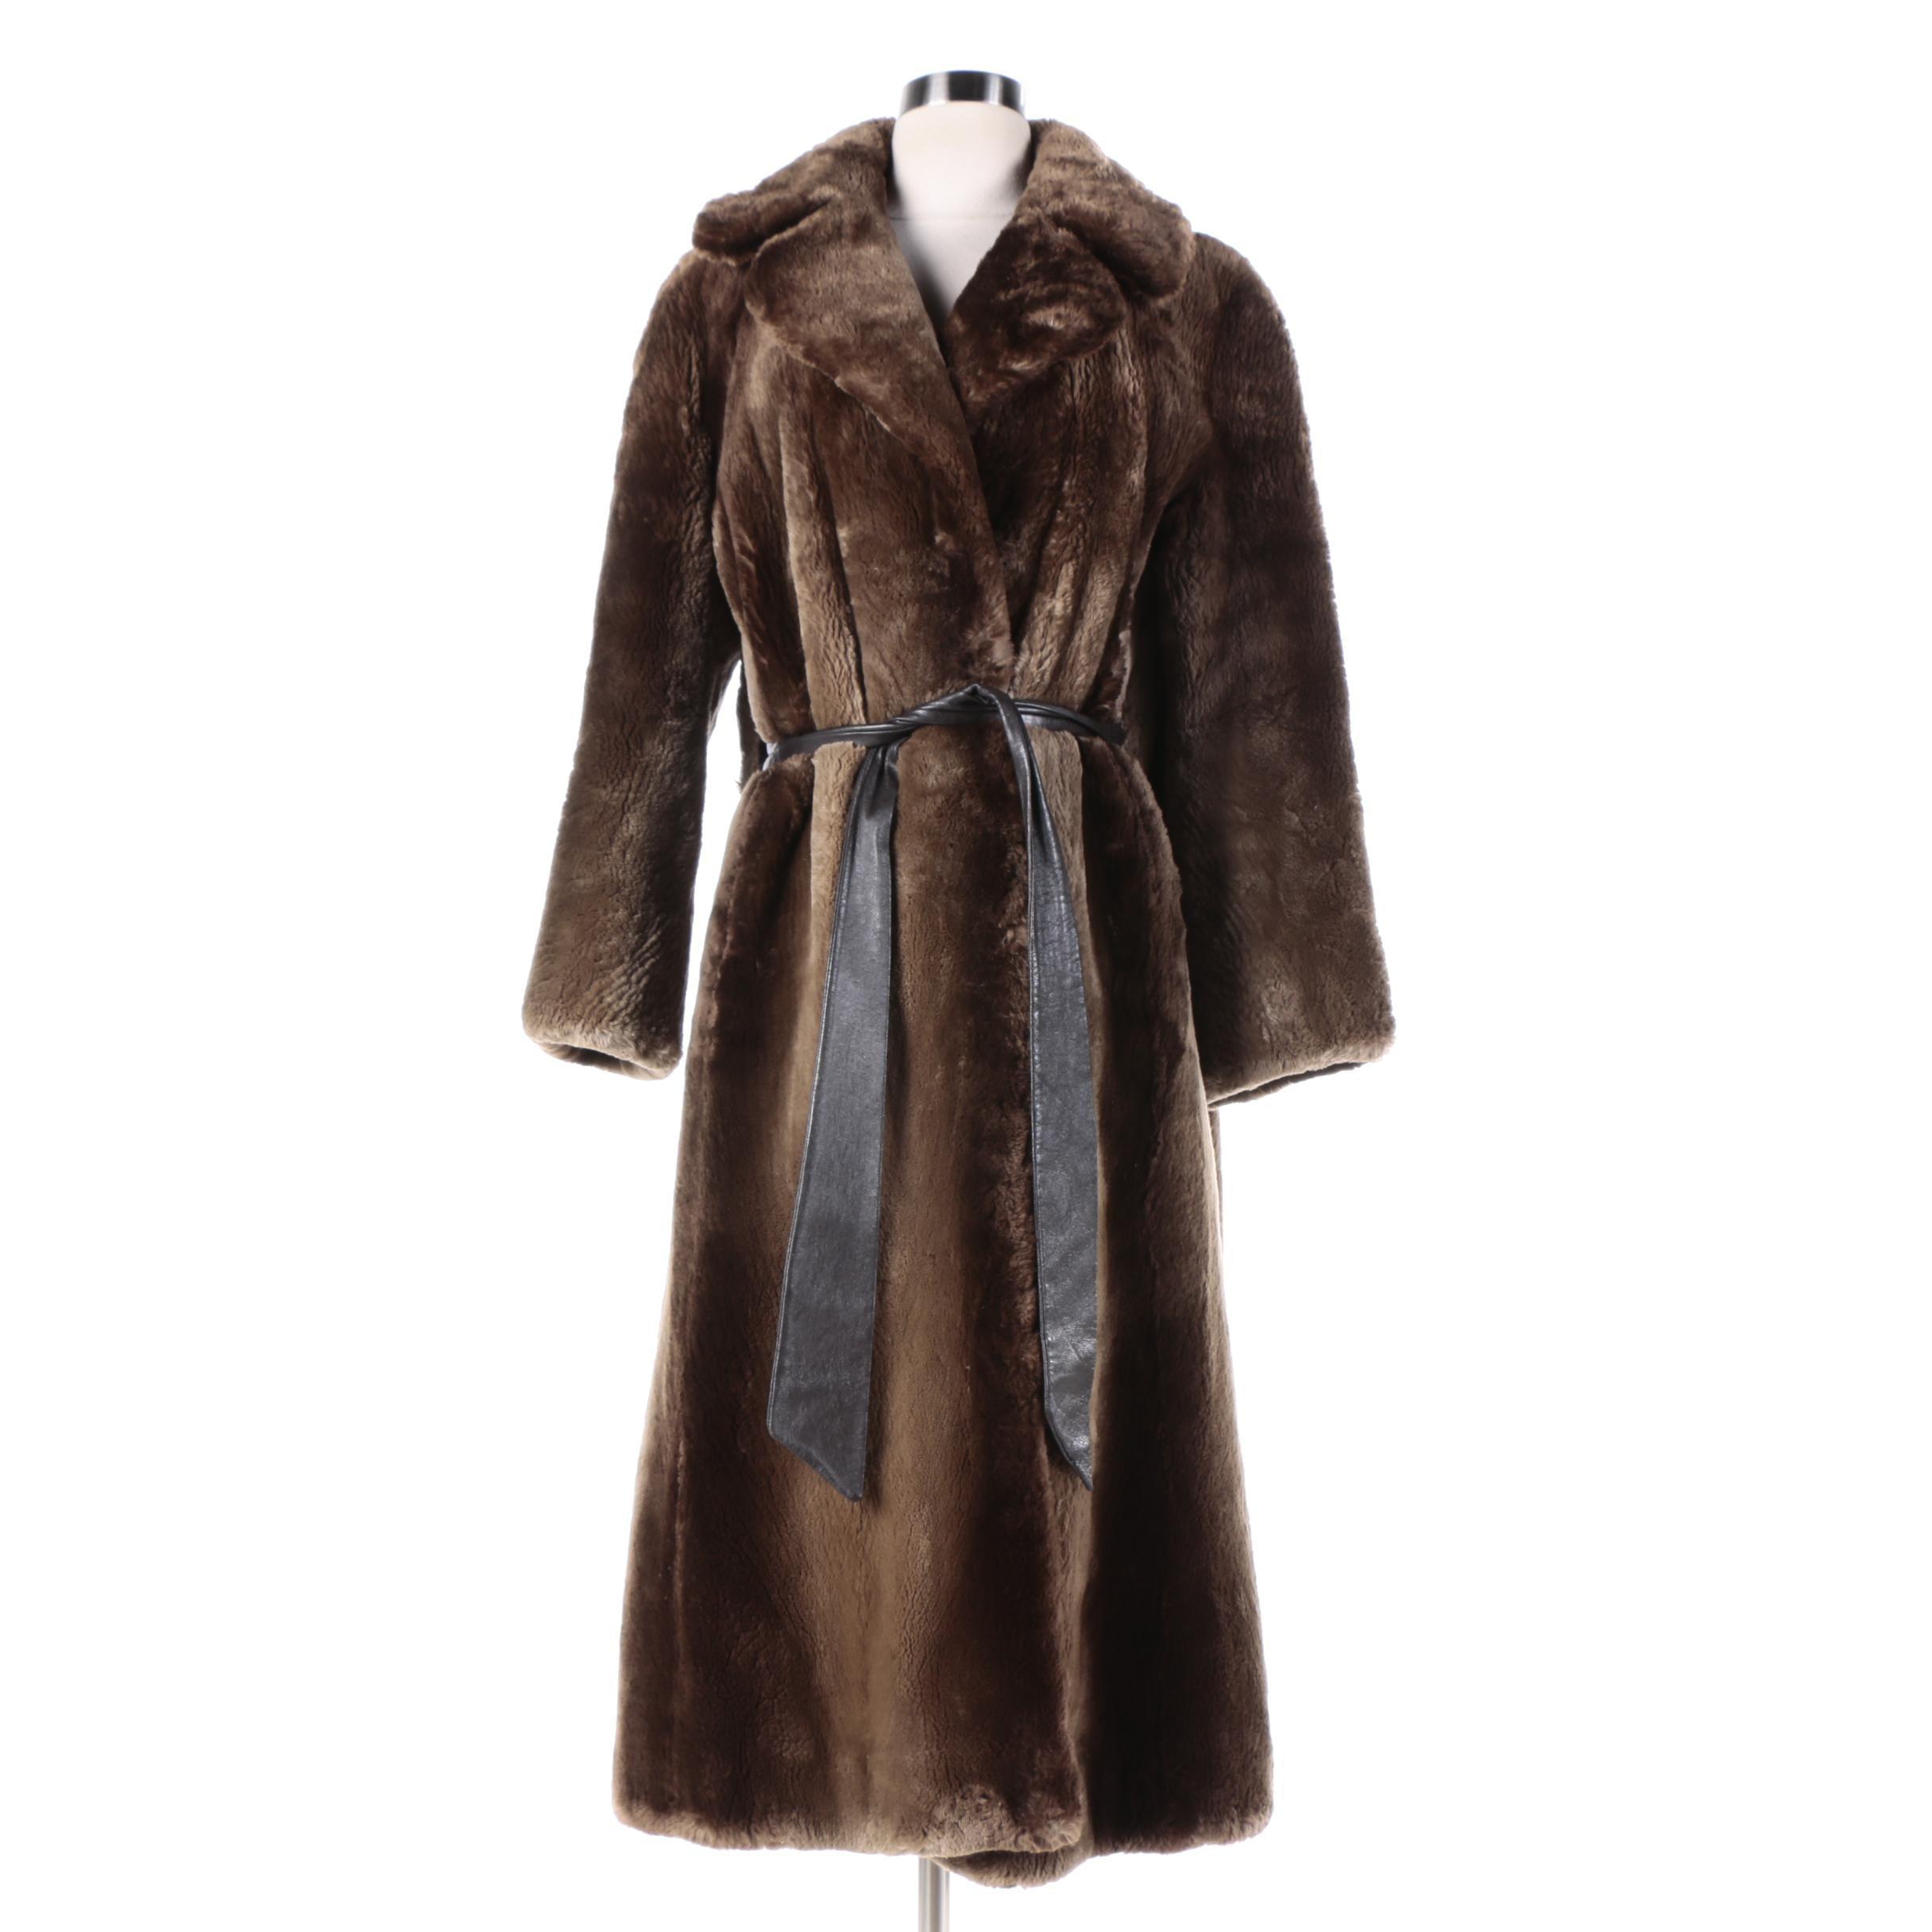 Vintage Sheared Beaver Fur Coat from Briskin-Berk Furs with Leather Tie Belt